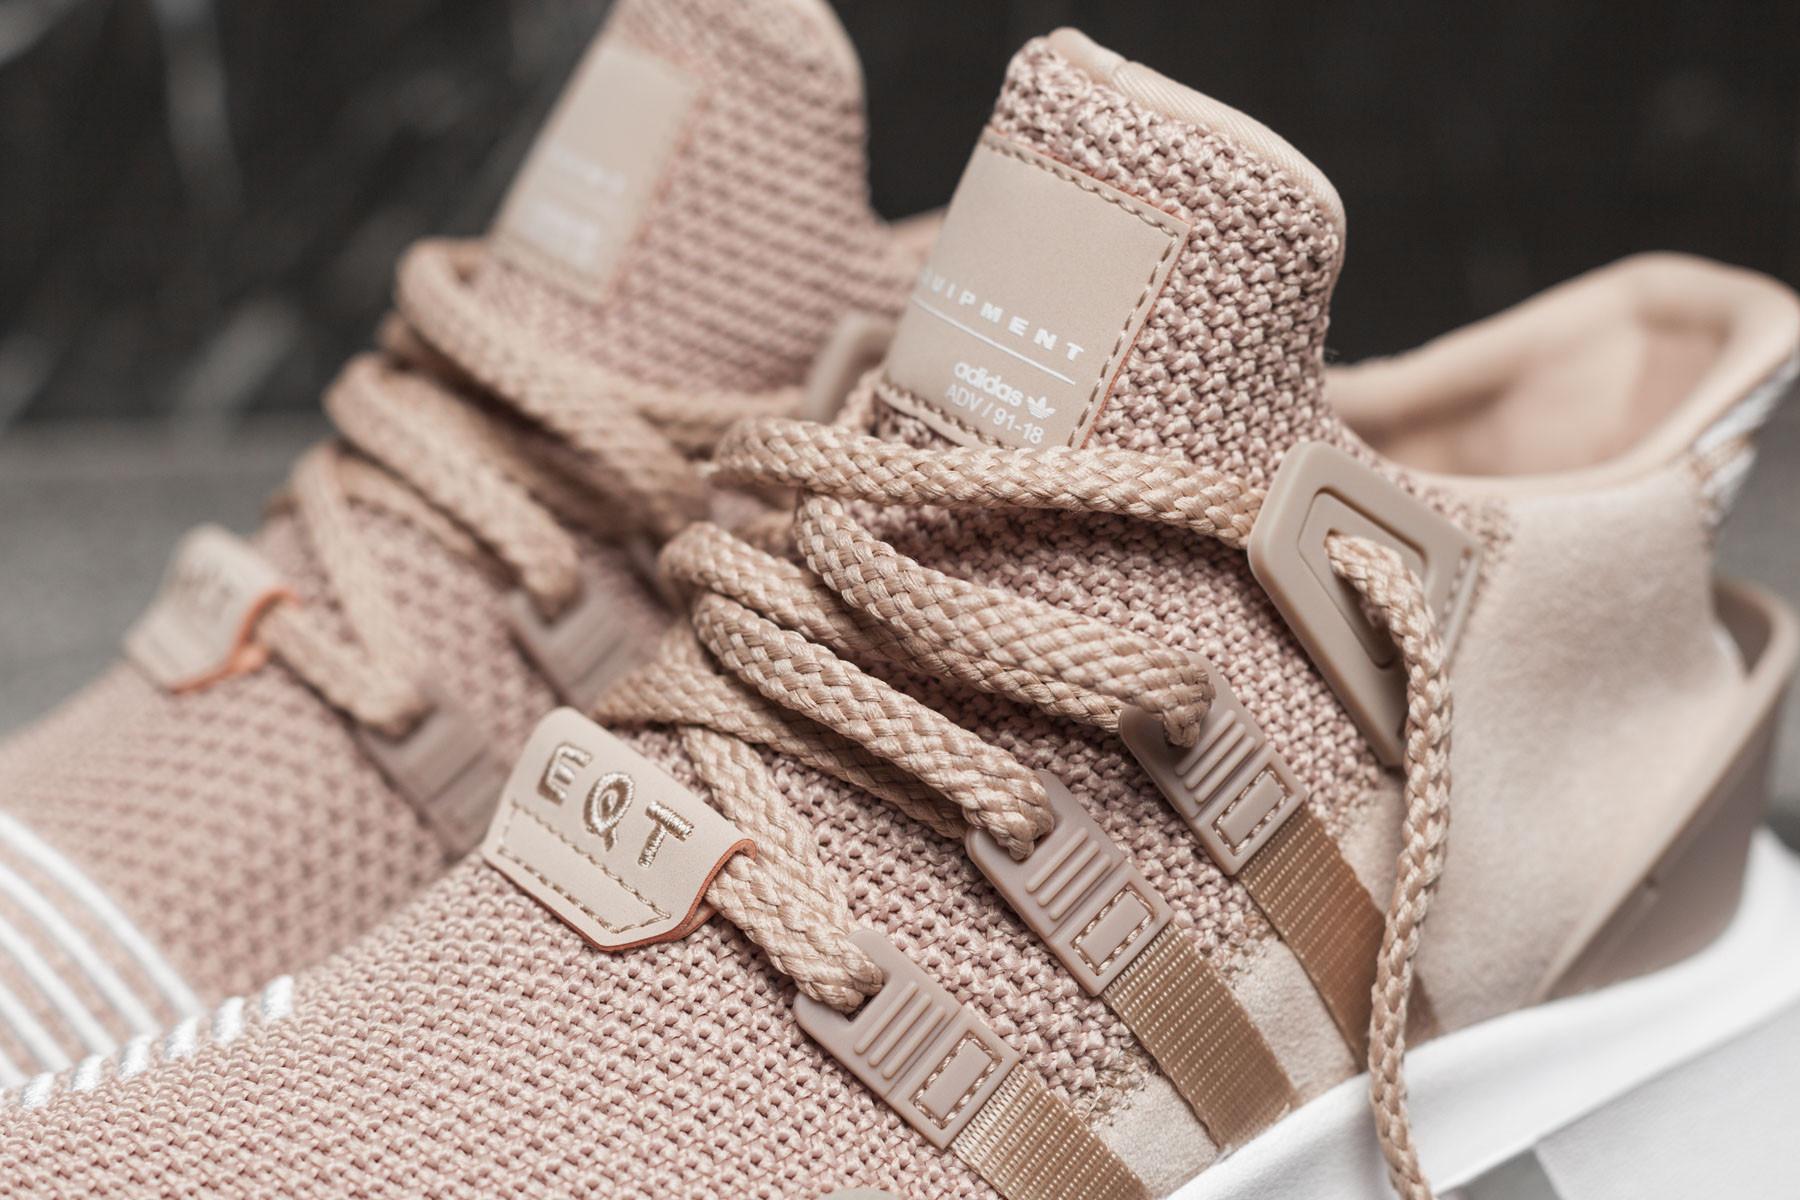 newest 0469d 190eb ... Ash Pearl Ftwr White) Super Cute W Adidas EQT BASK ADV - Sneakers -  Sneaker.no